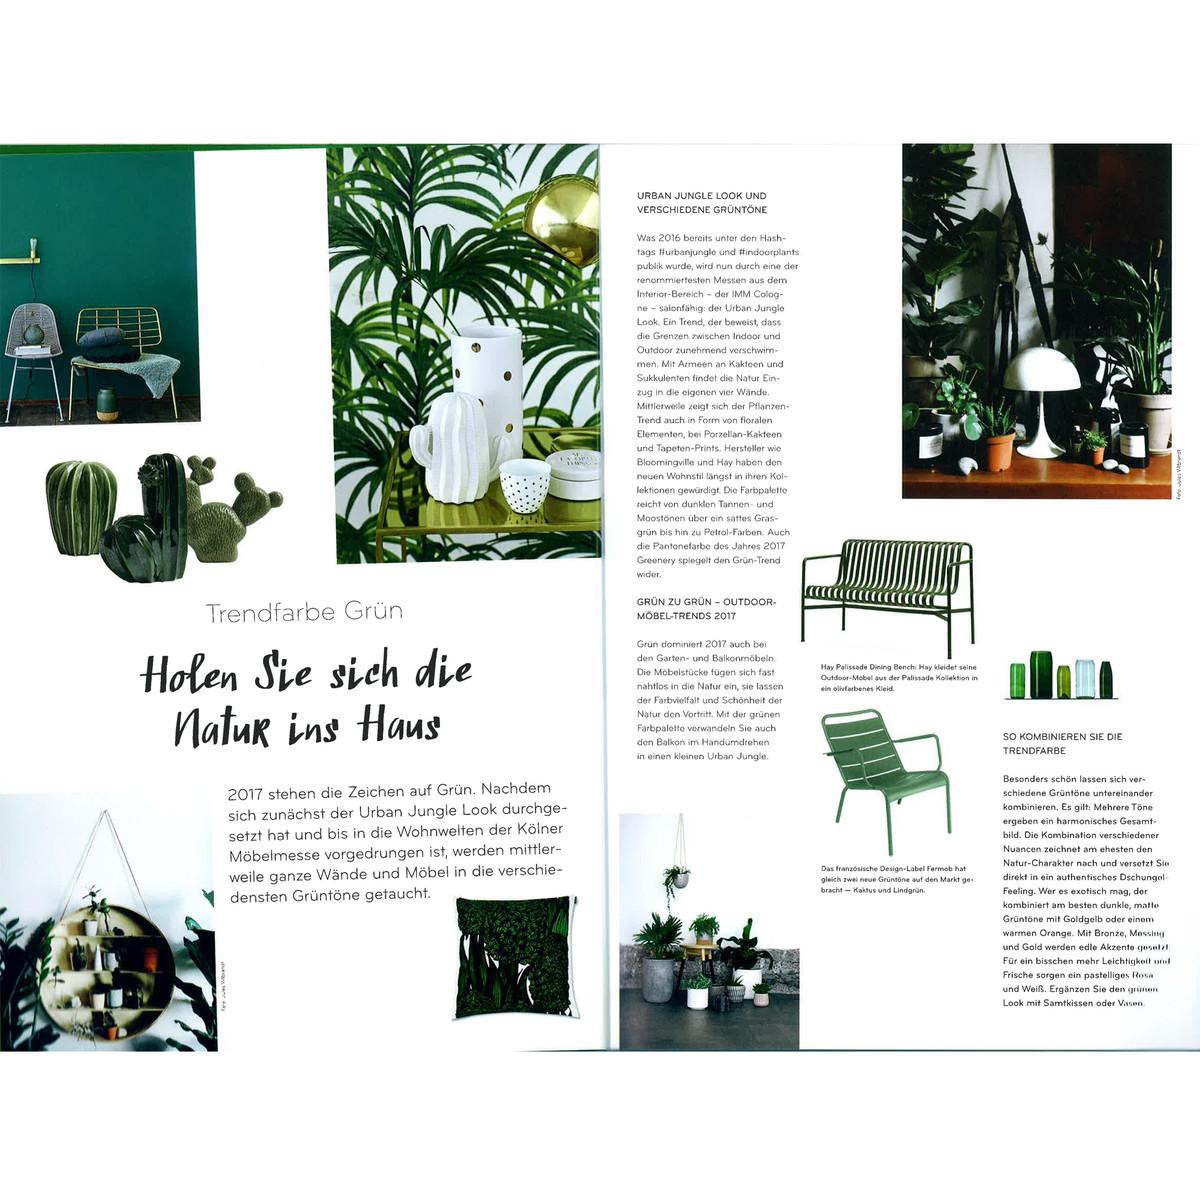 Ikea katalog 2016 bestellen katalogbestellung wohndesign for Wohndesign shop